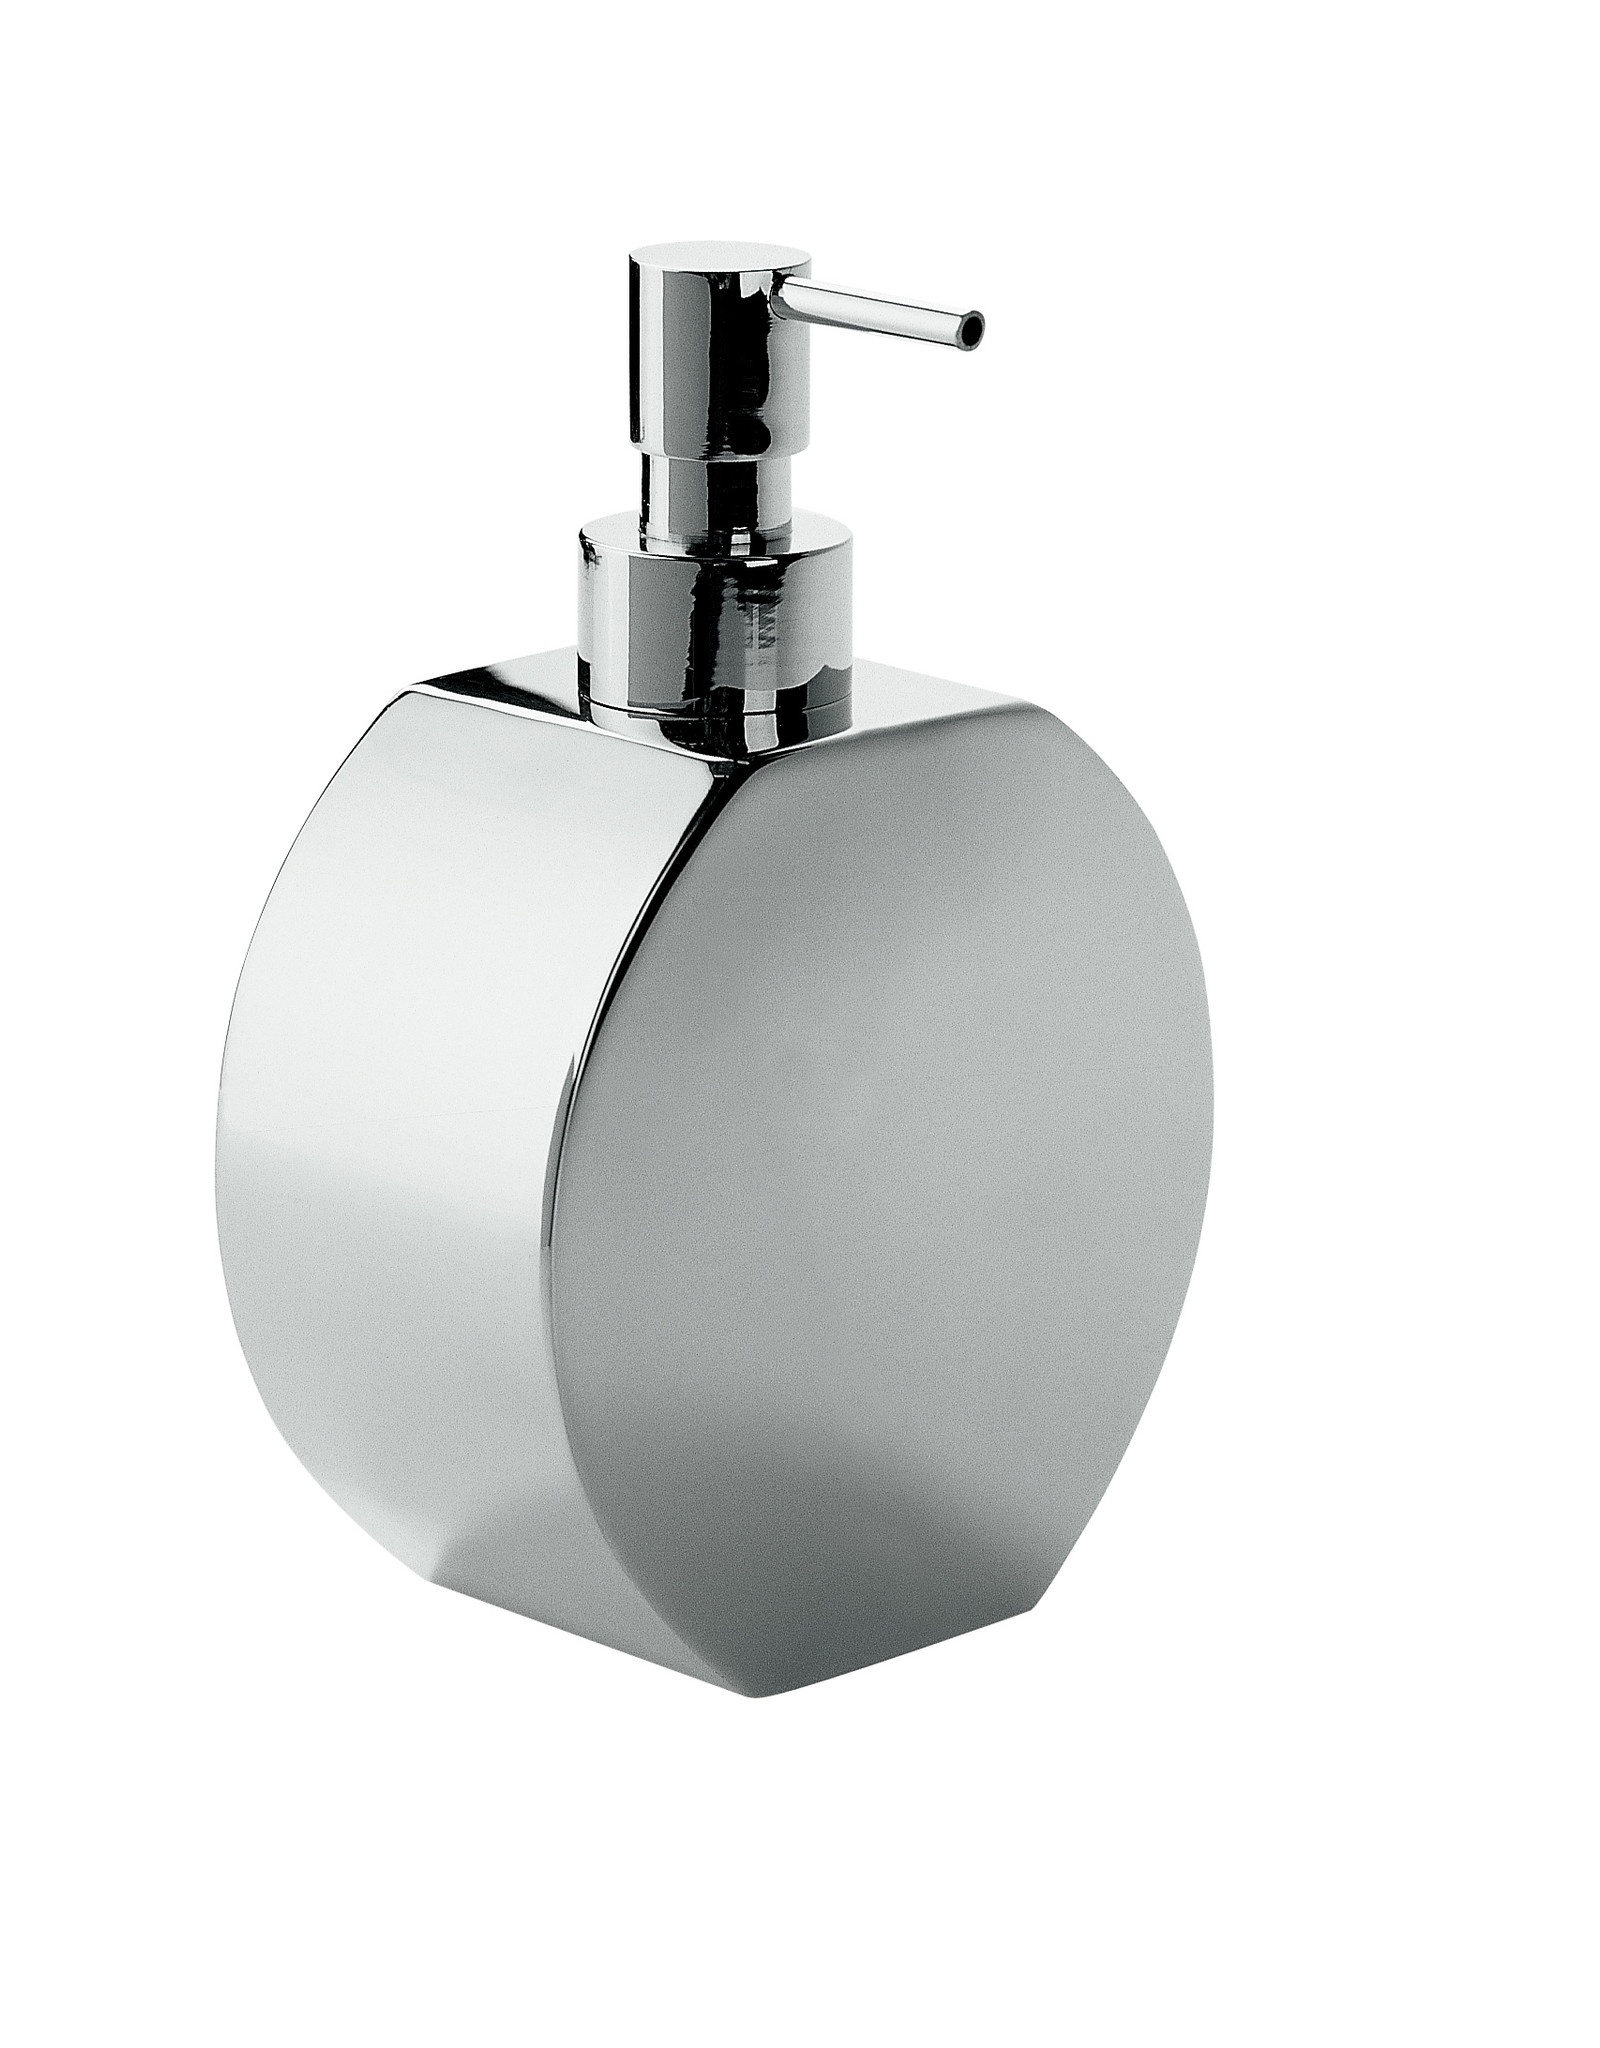 Saon soap dispenser 17cm, freestanding - outlet